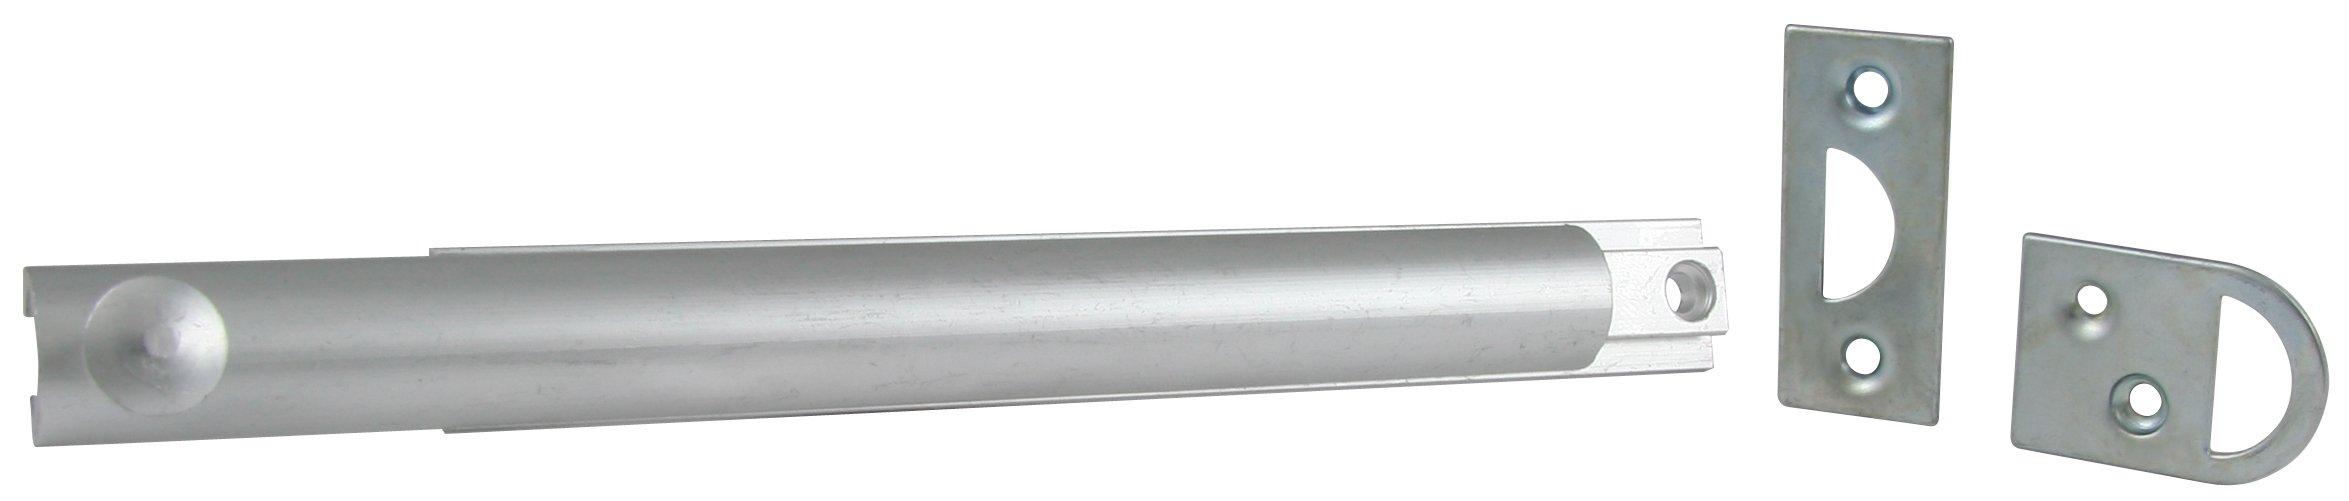 Ultra Hardware 8010 Aluminum Surface Bolt